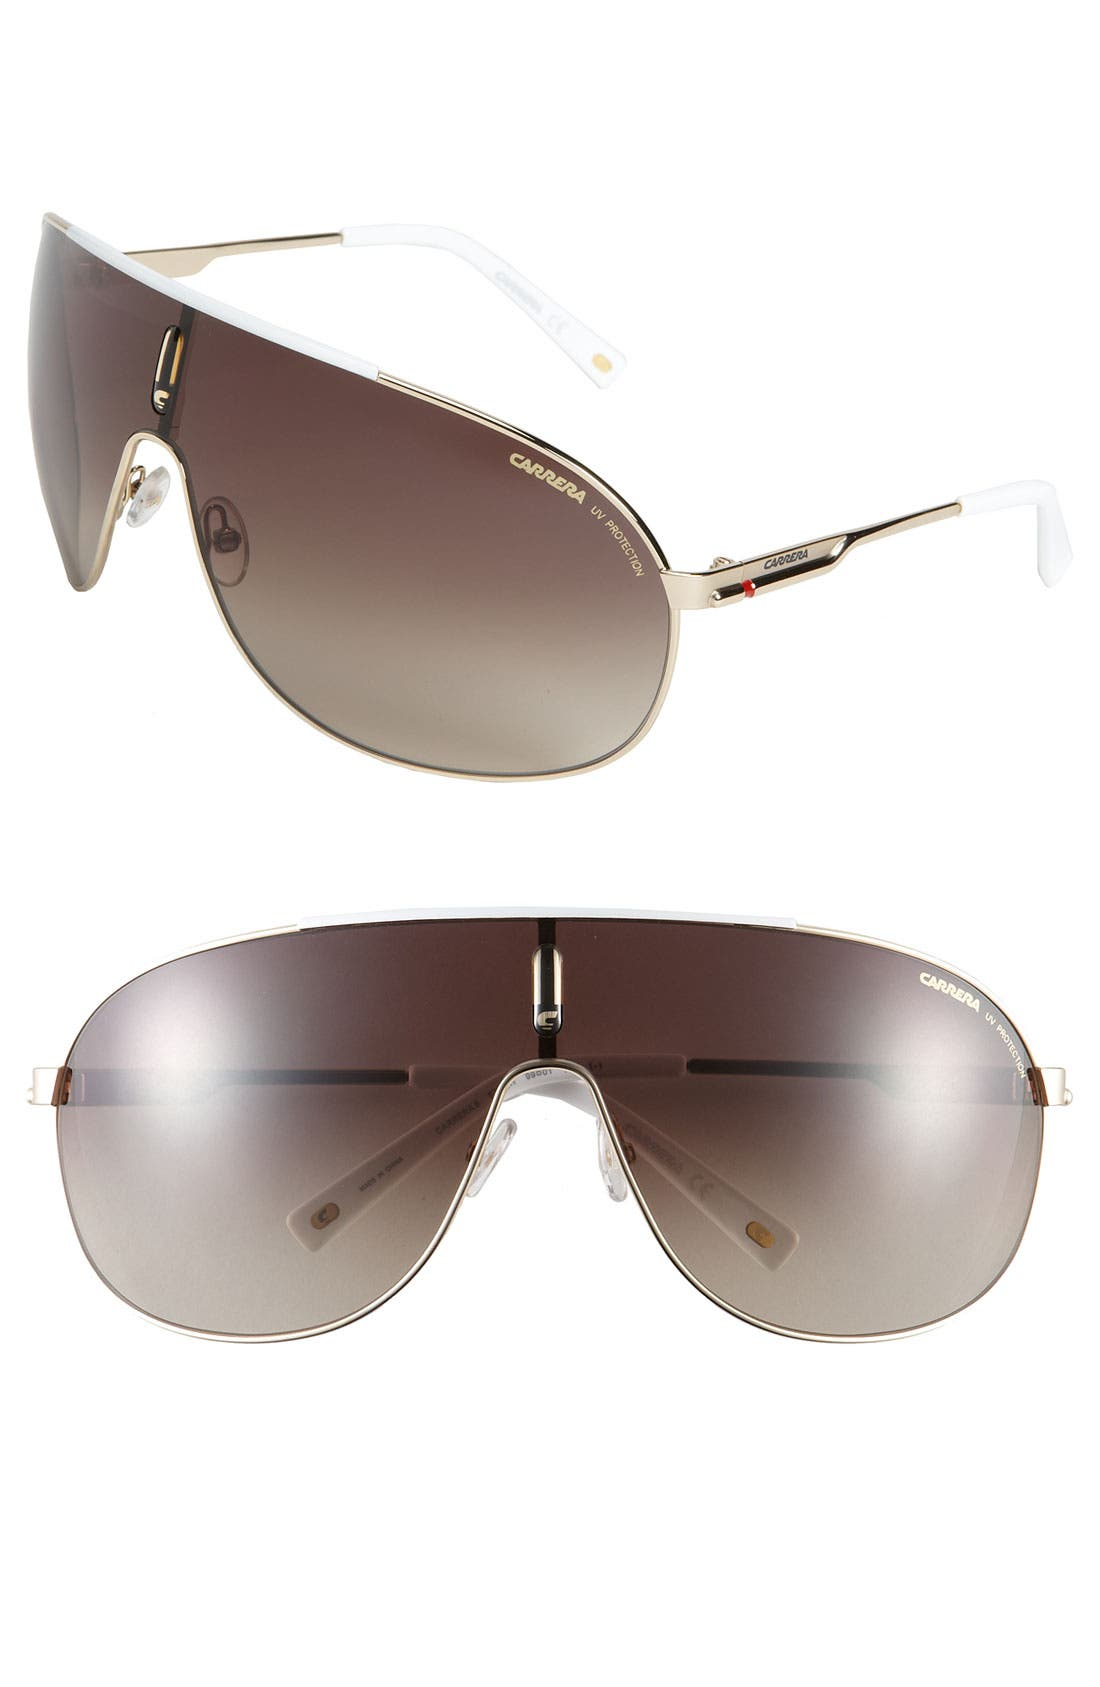 Main Image - Carrera Eyewear Metal Aviators